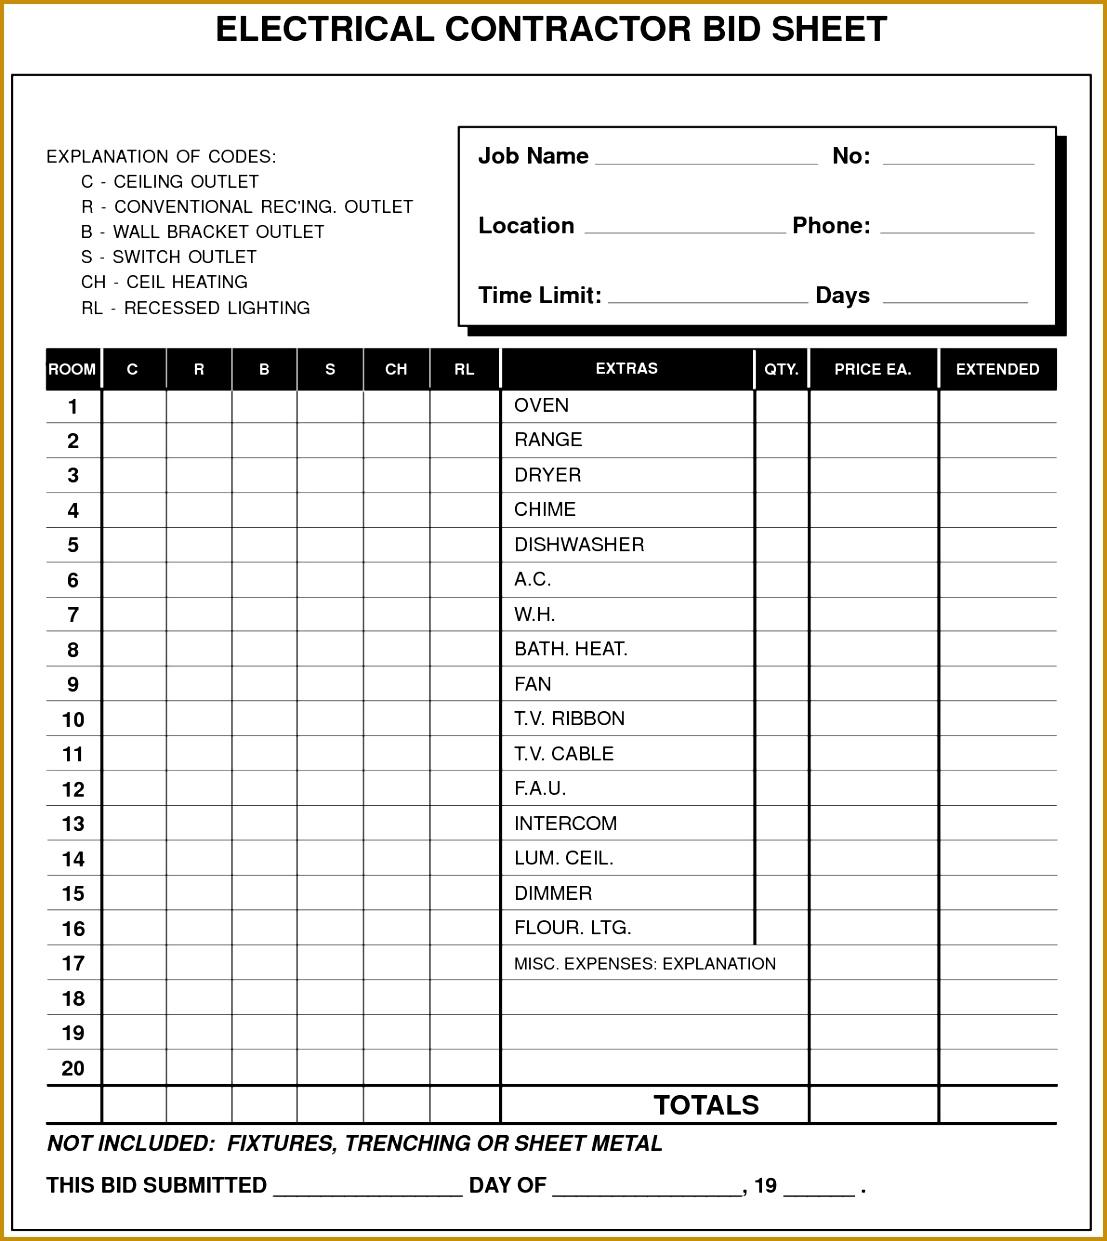 Electrical Contractor Bid Sheet 12411107